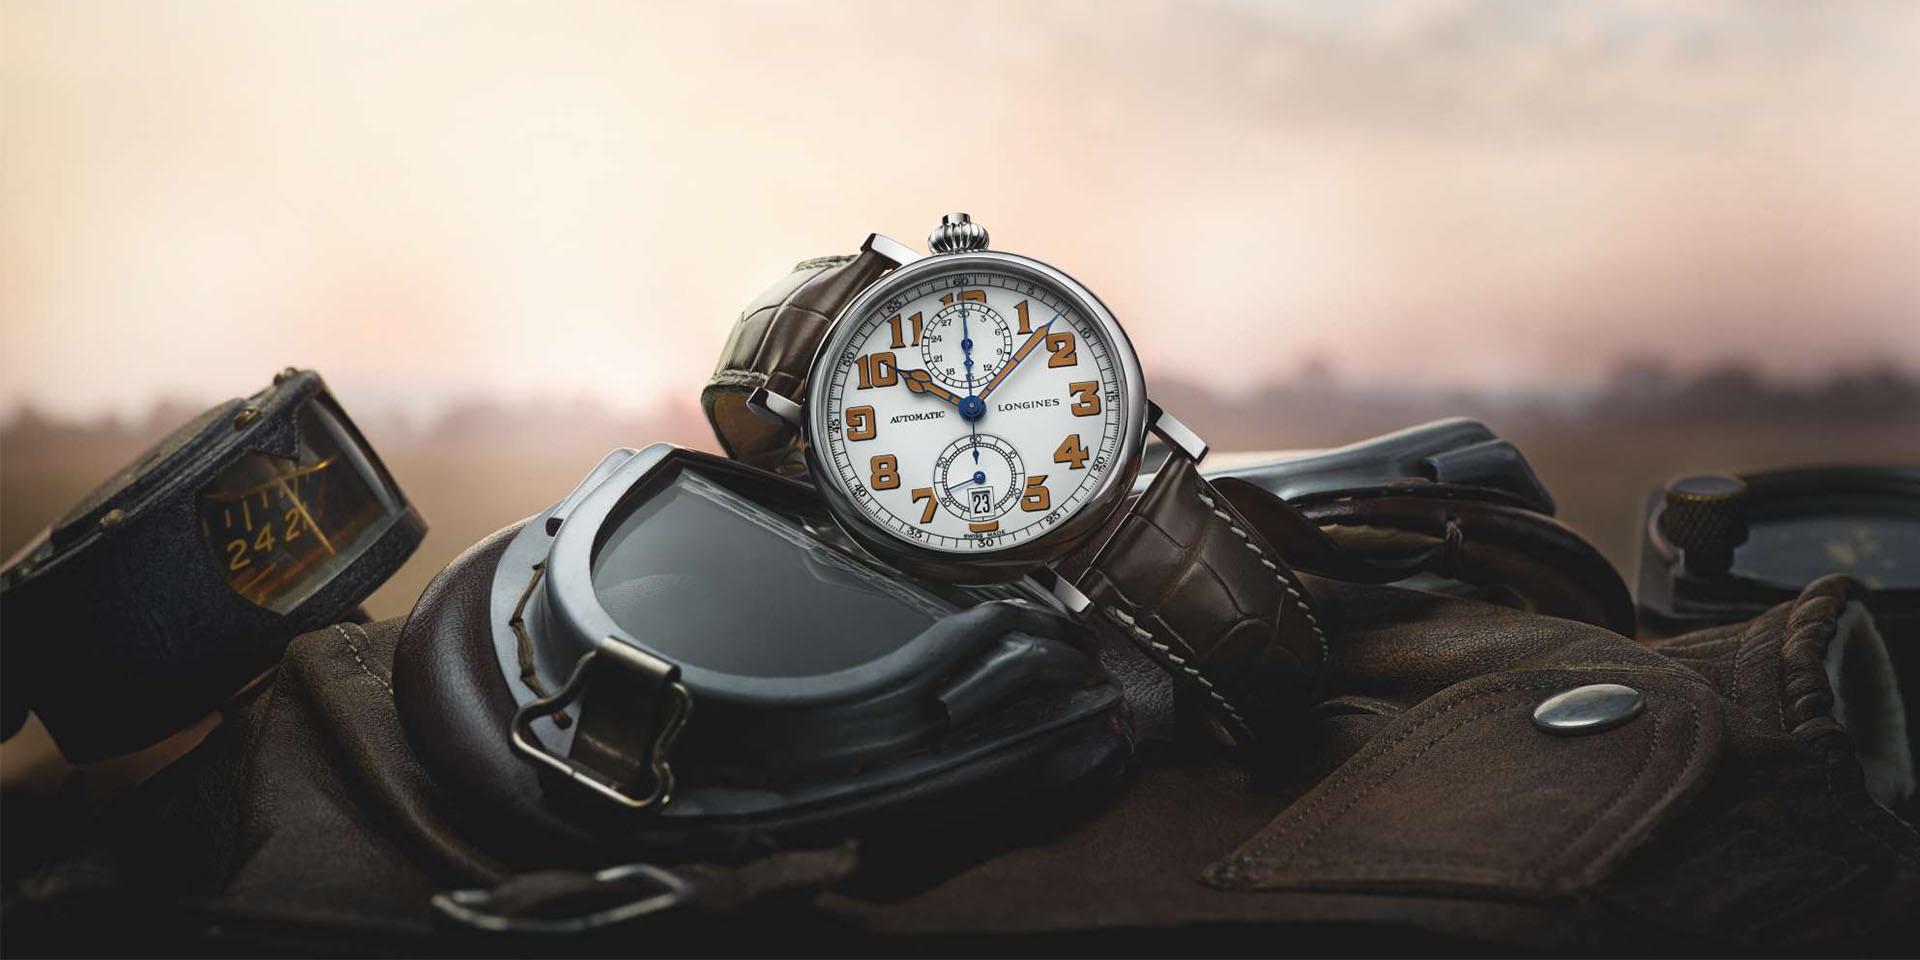 Longines-Avigation-Watch-Type-A-7-1935-slider.jpg